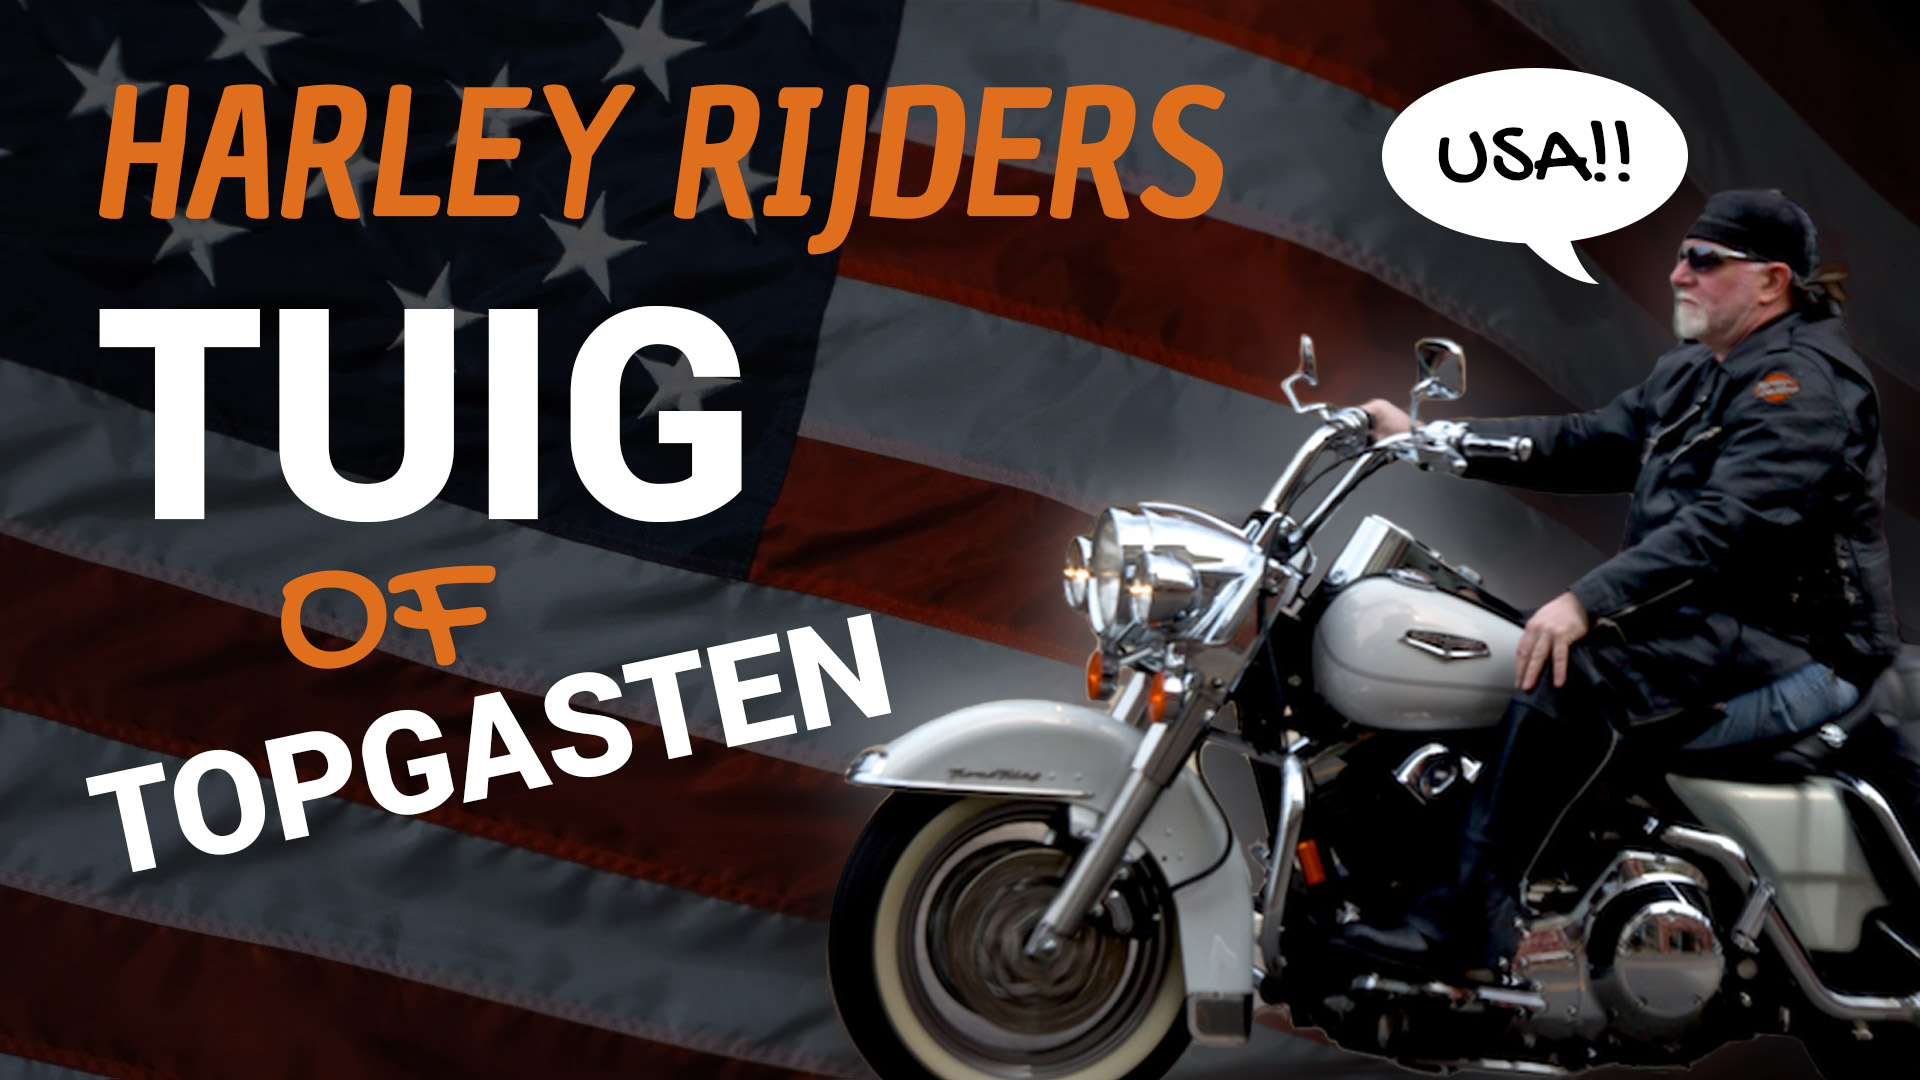 Harley rijders: Tuig of Topgasten?